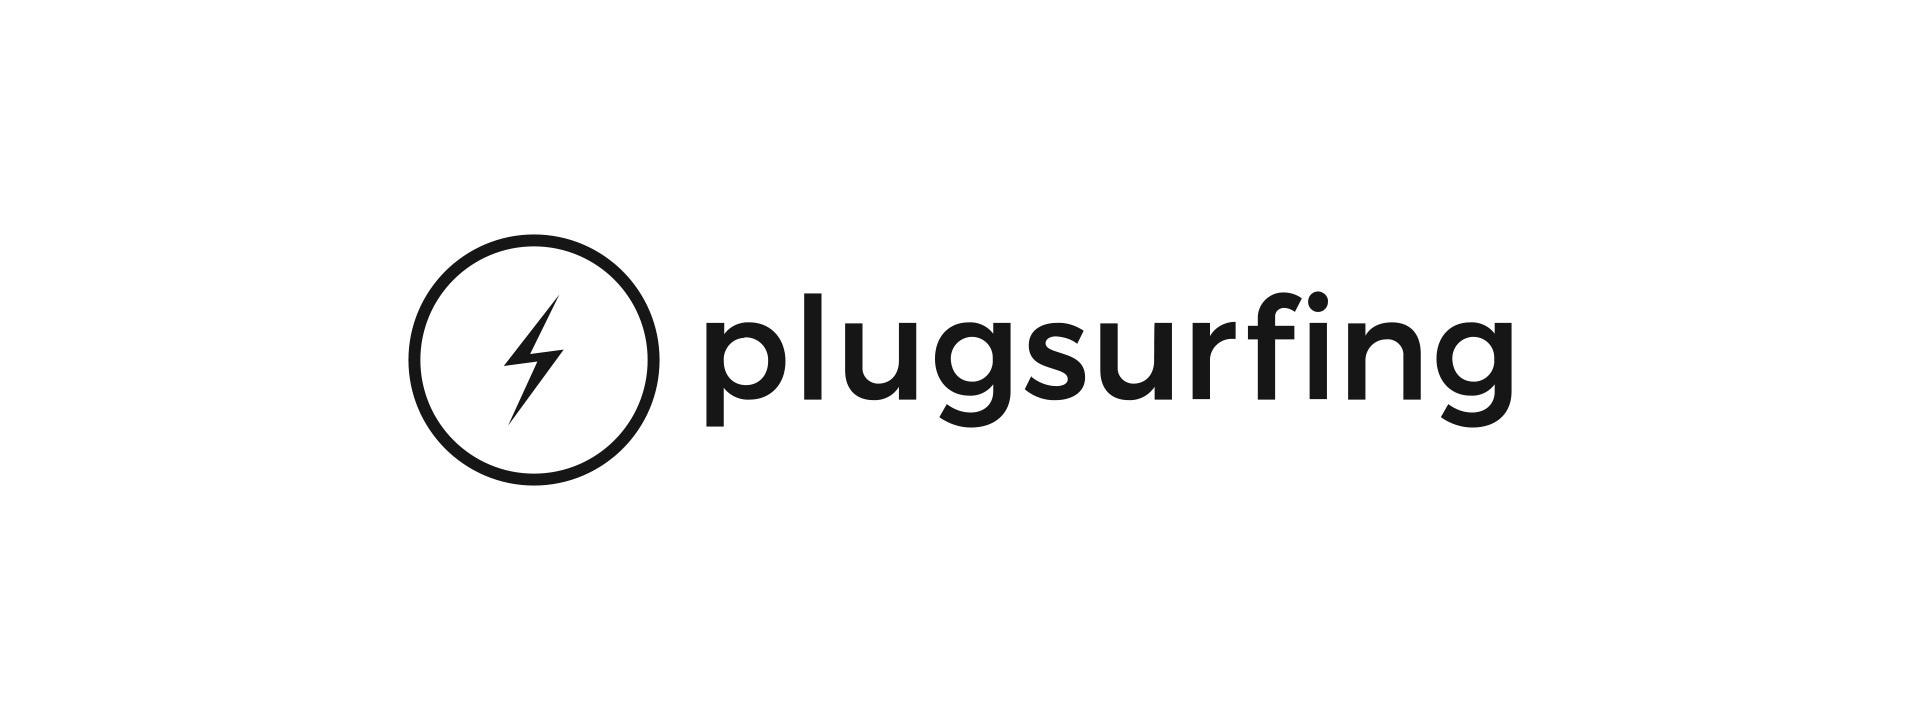 logo plugsurfing mistergreen